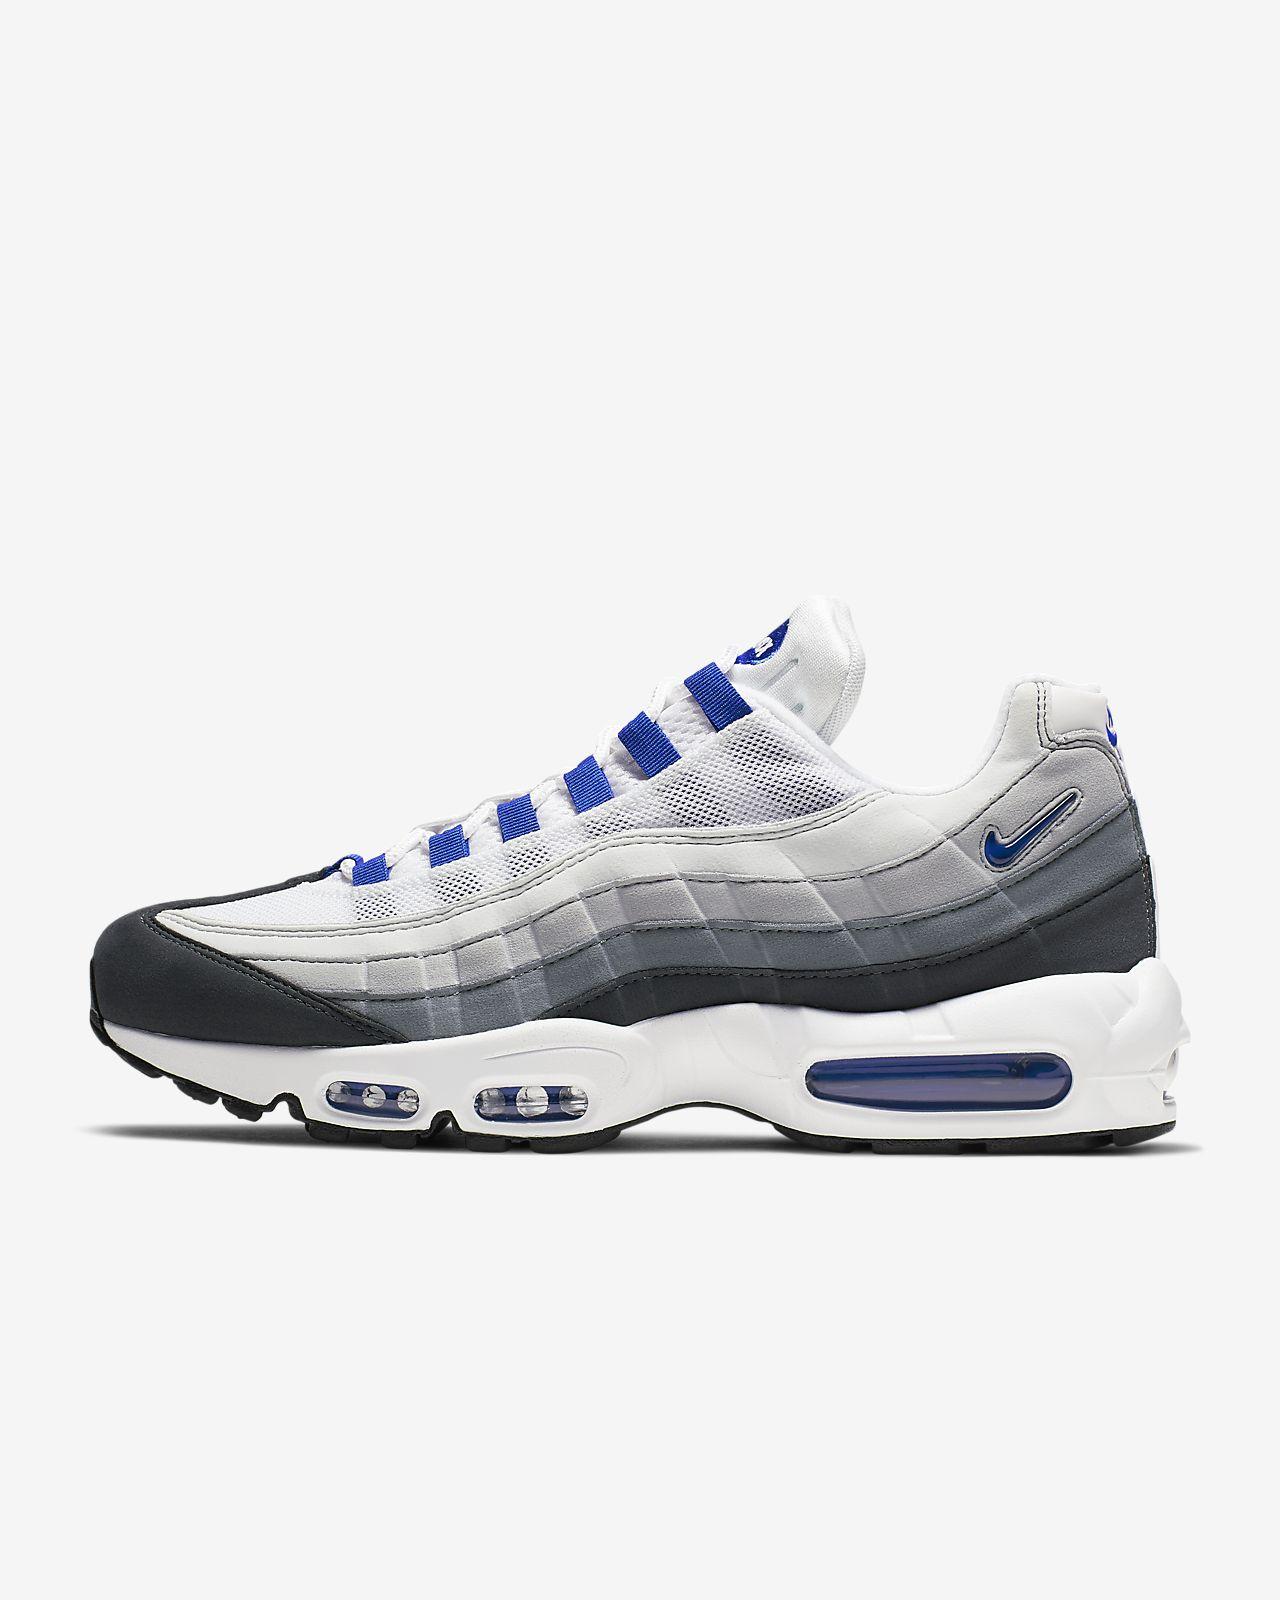 cd4339a5 Мужские кроссовки Nike Air Max 95 SC. Nike.com RU